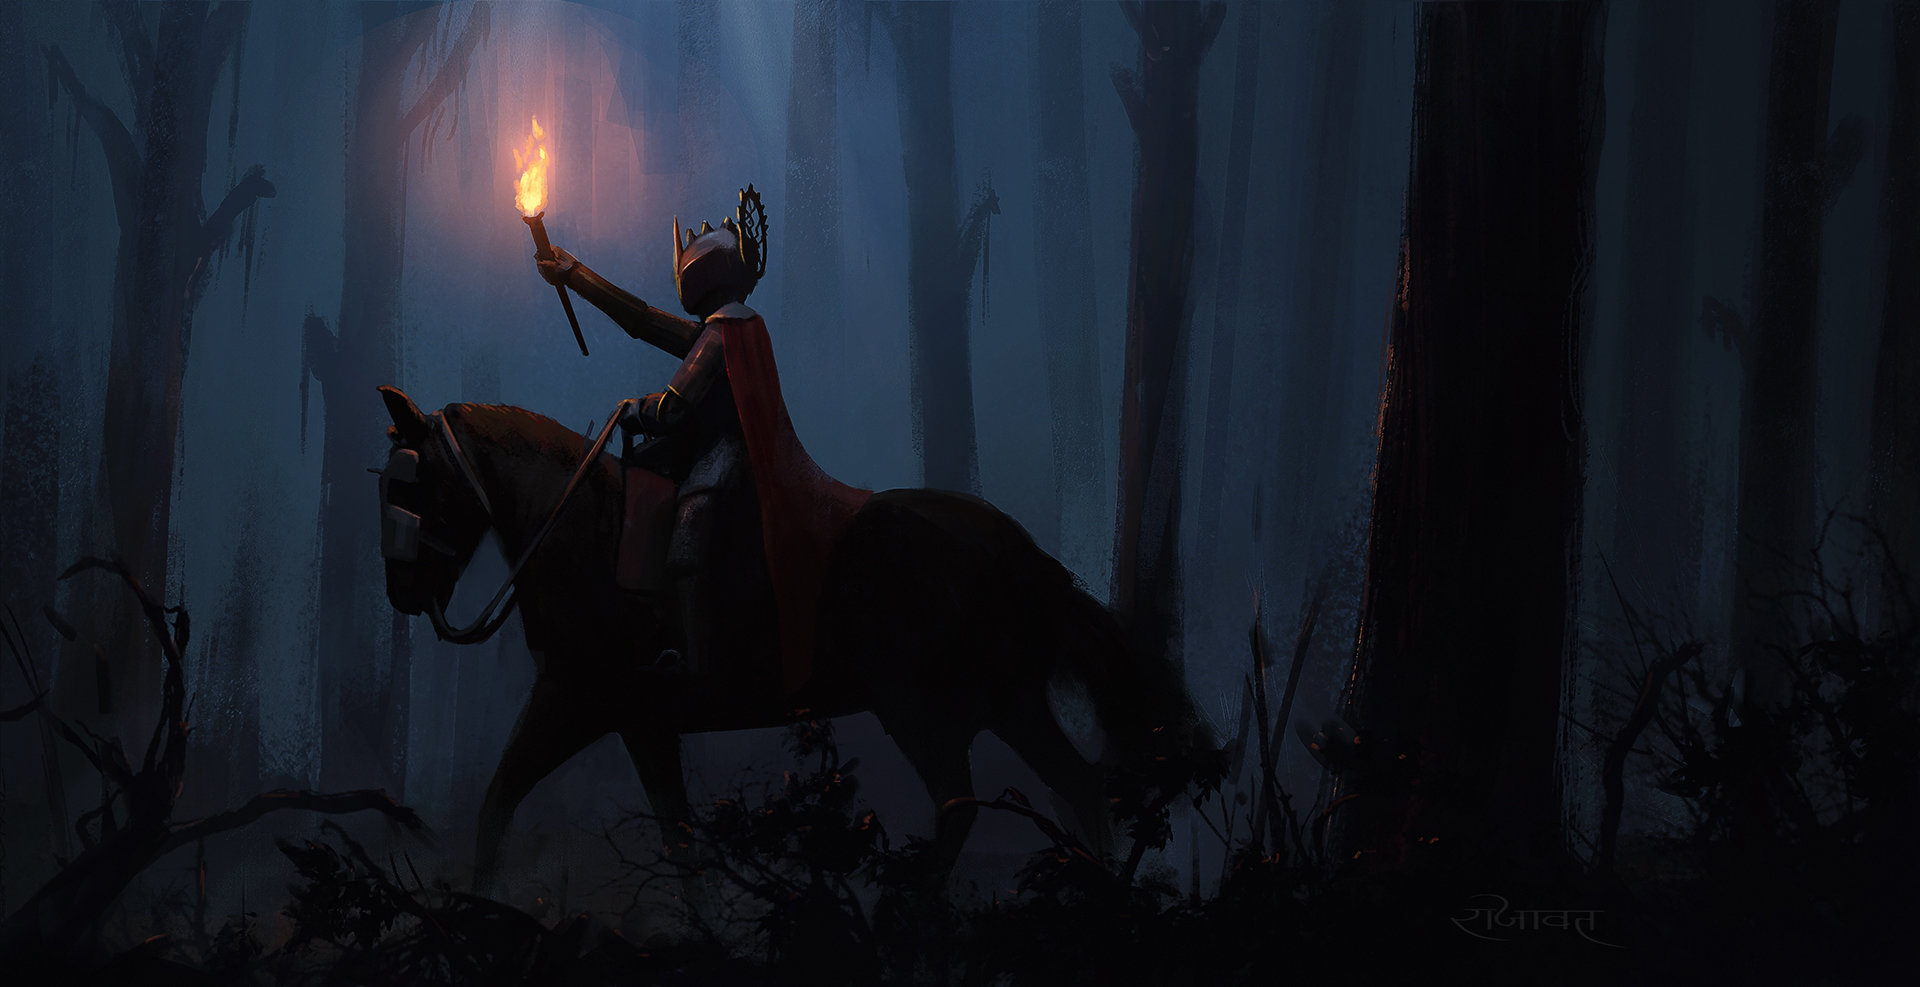 Surendra pratap singh rajawat knight